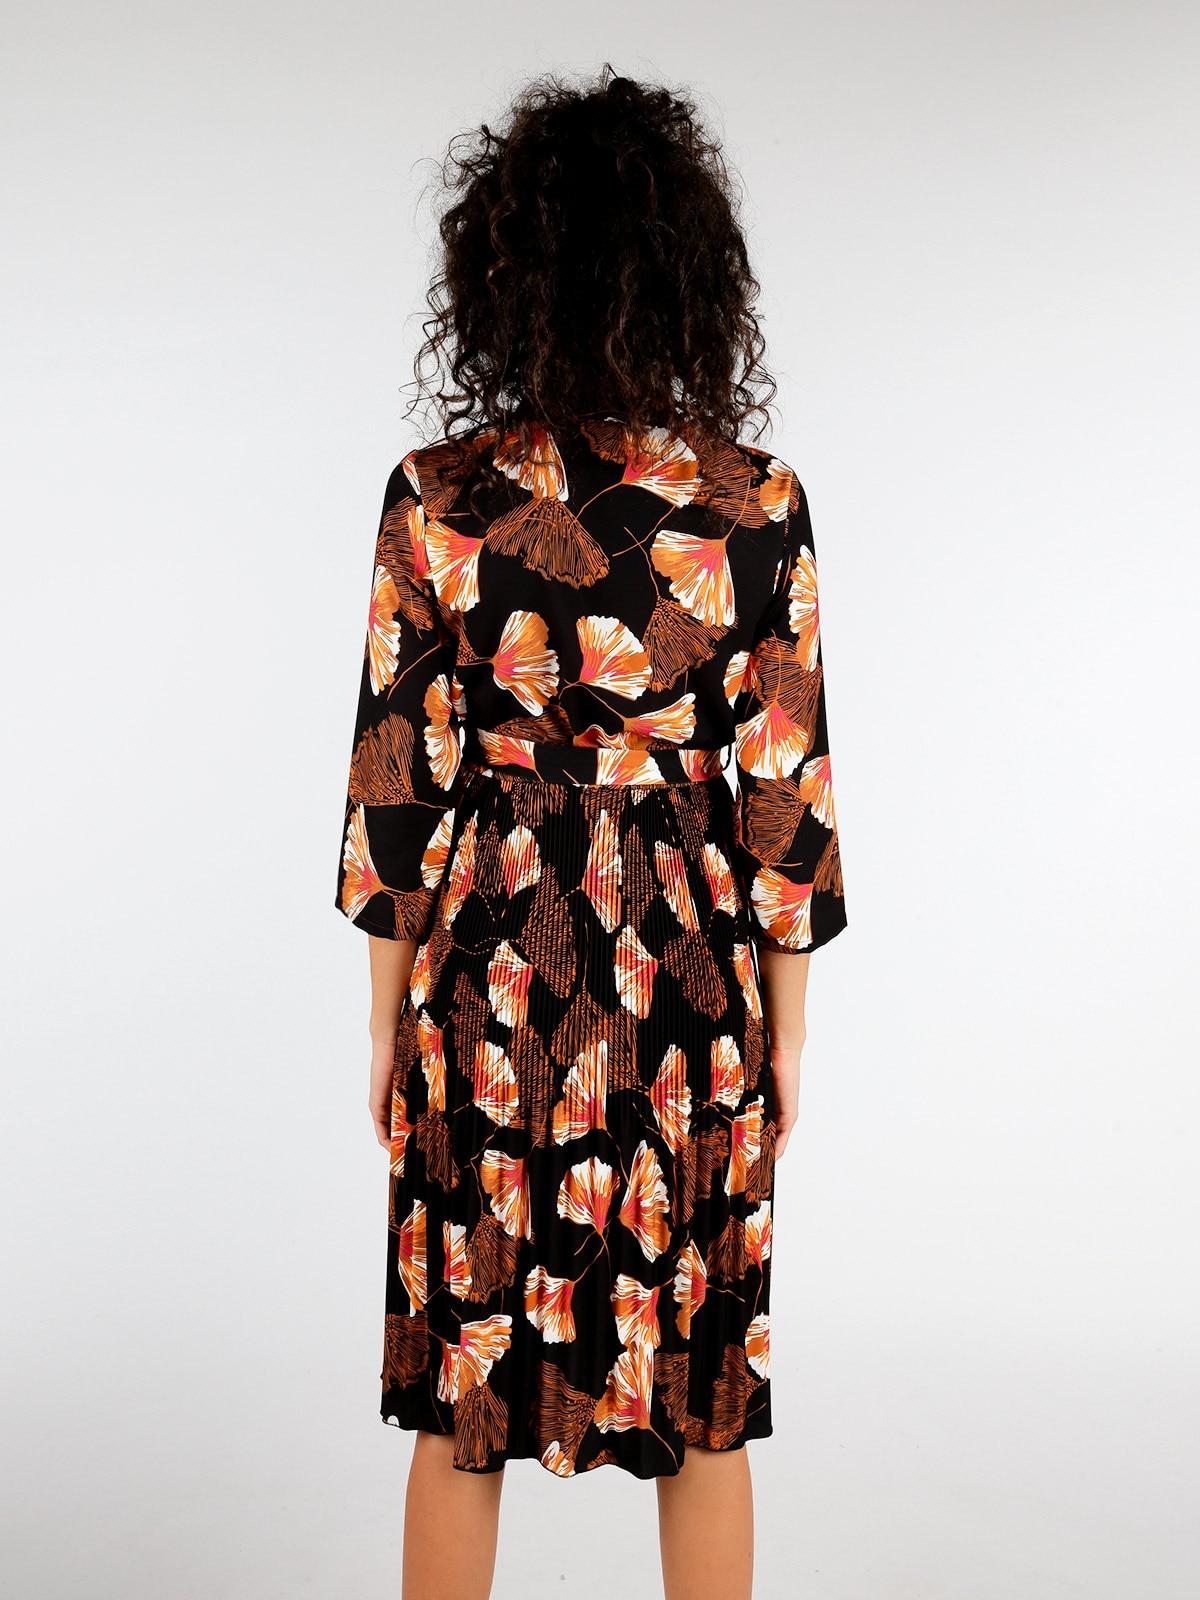 Fantaisie À À Robe Robe Chemise Chemise Fantaisie À wqWXaZ